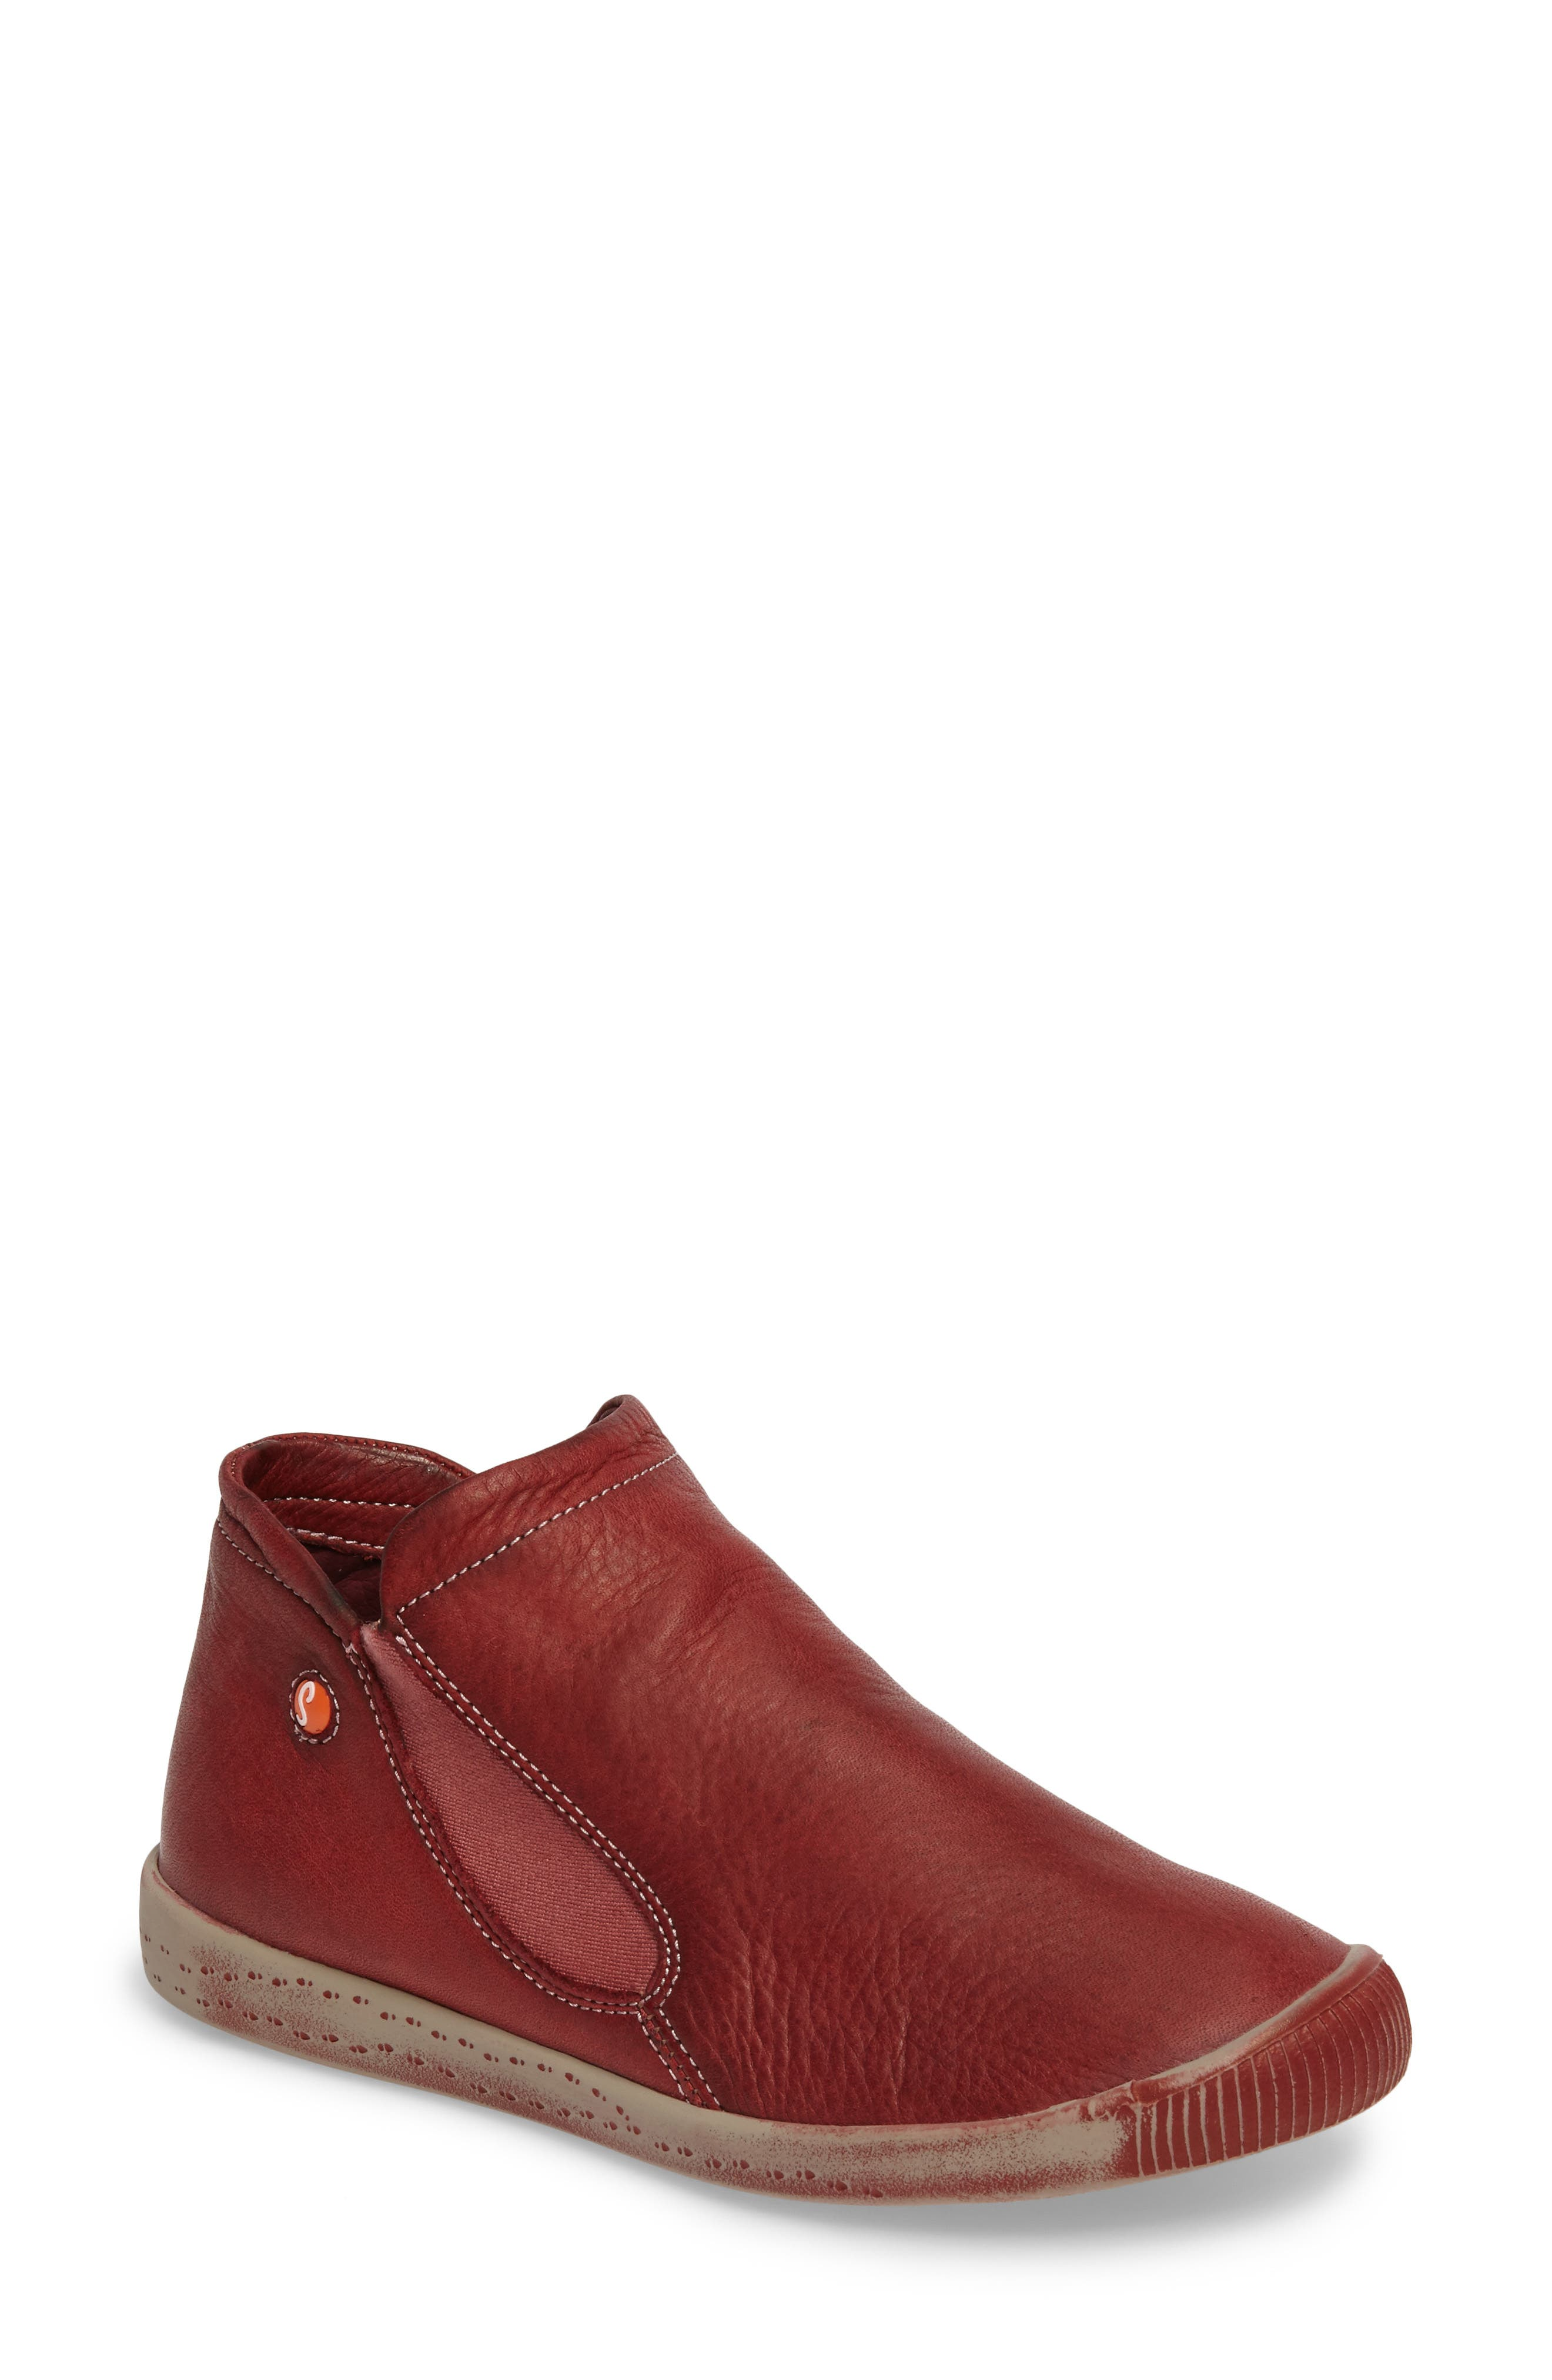 Softinos by Fly London Inge Slip-On Sneaker (Women)